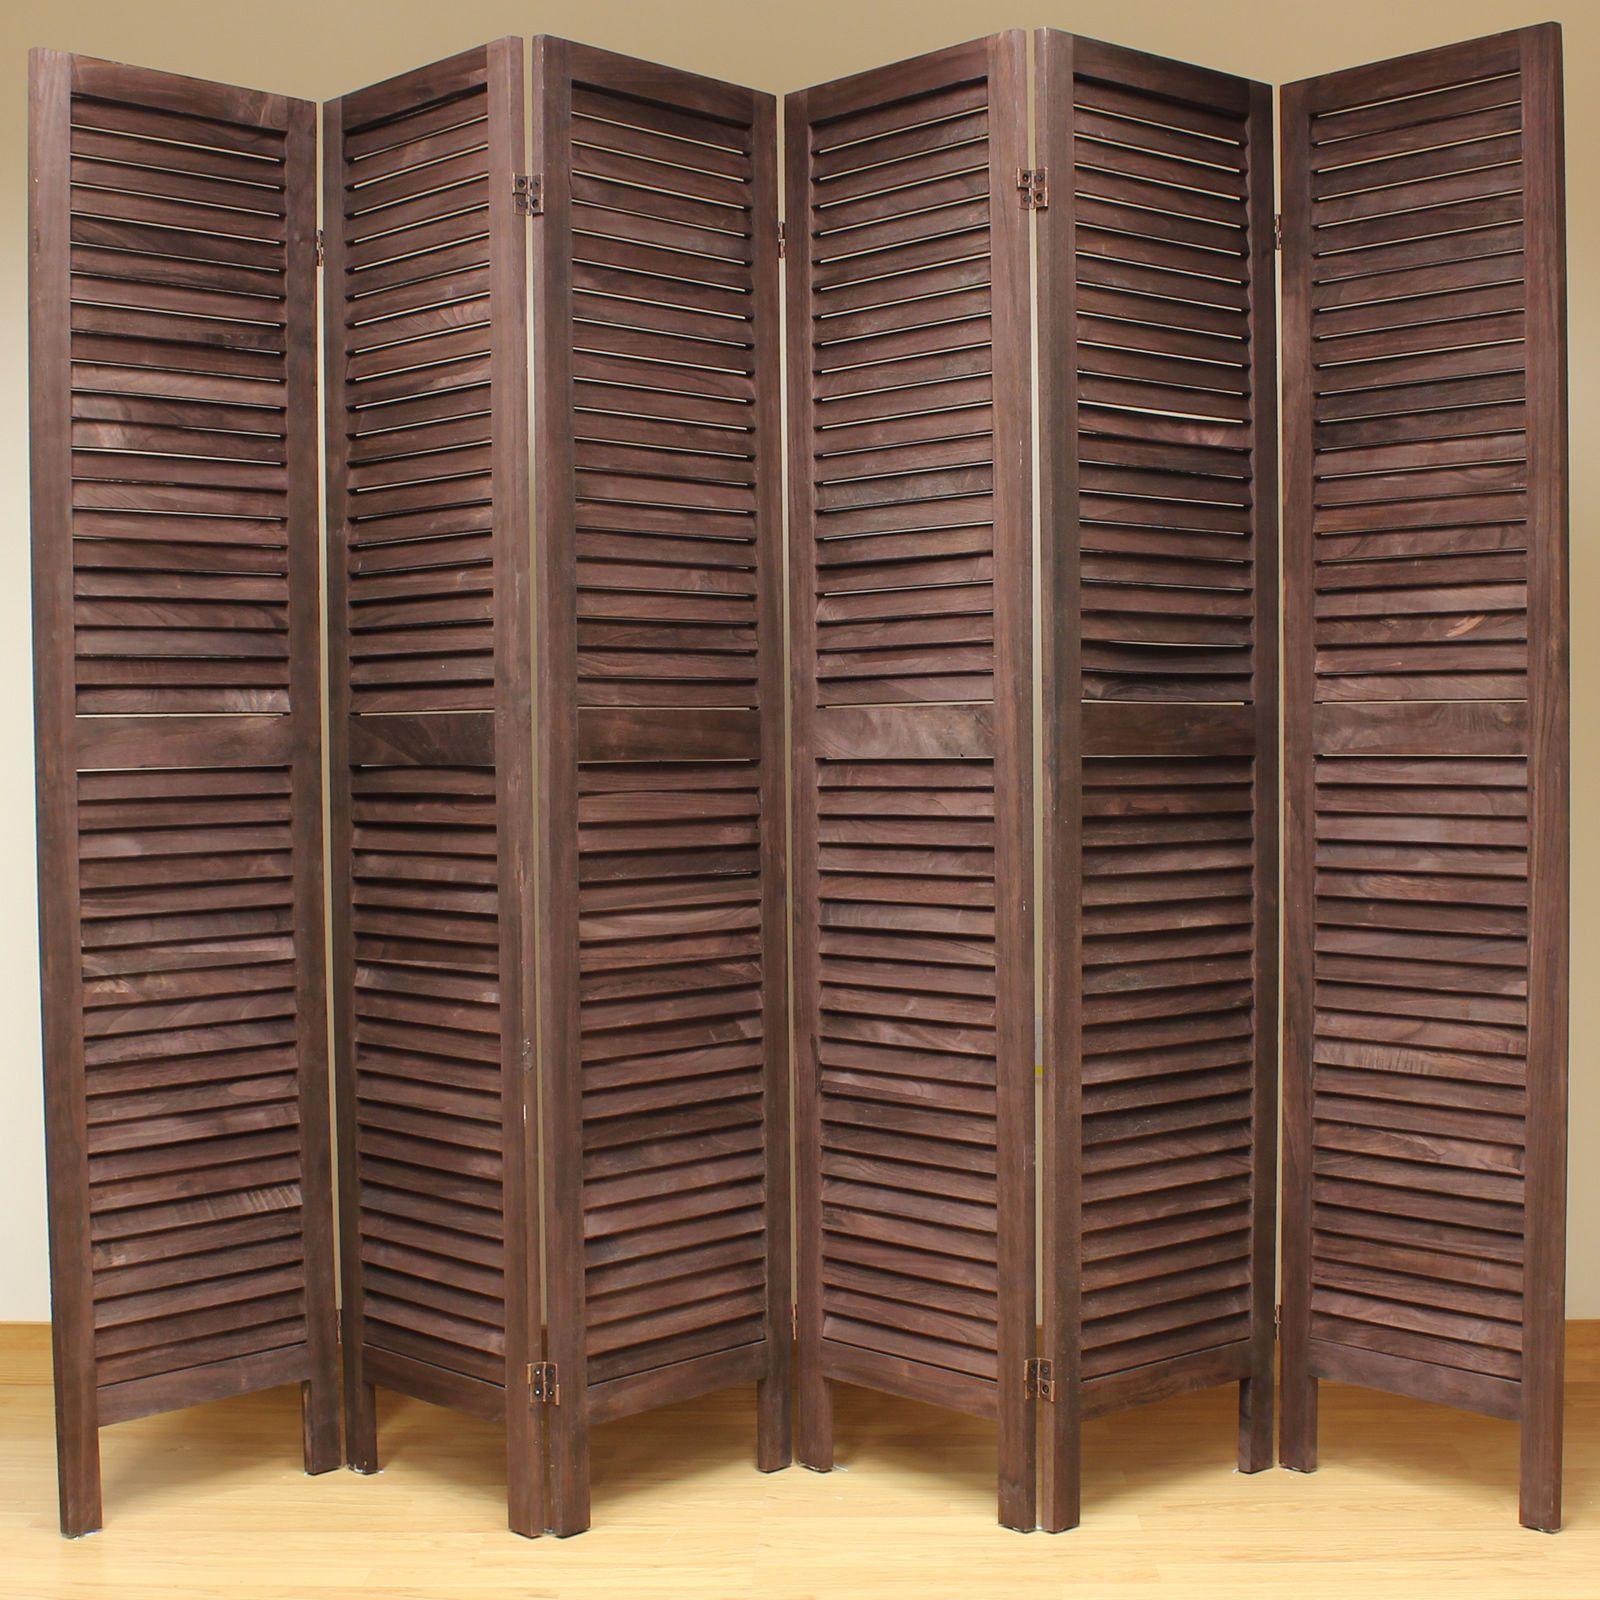 Wooden Slat Room Divider Screen 6 Panel Brown